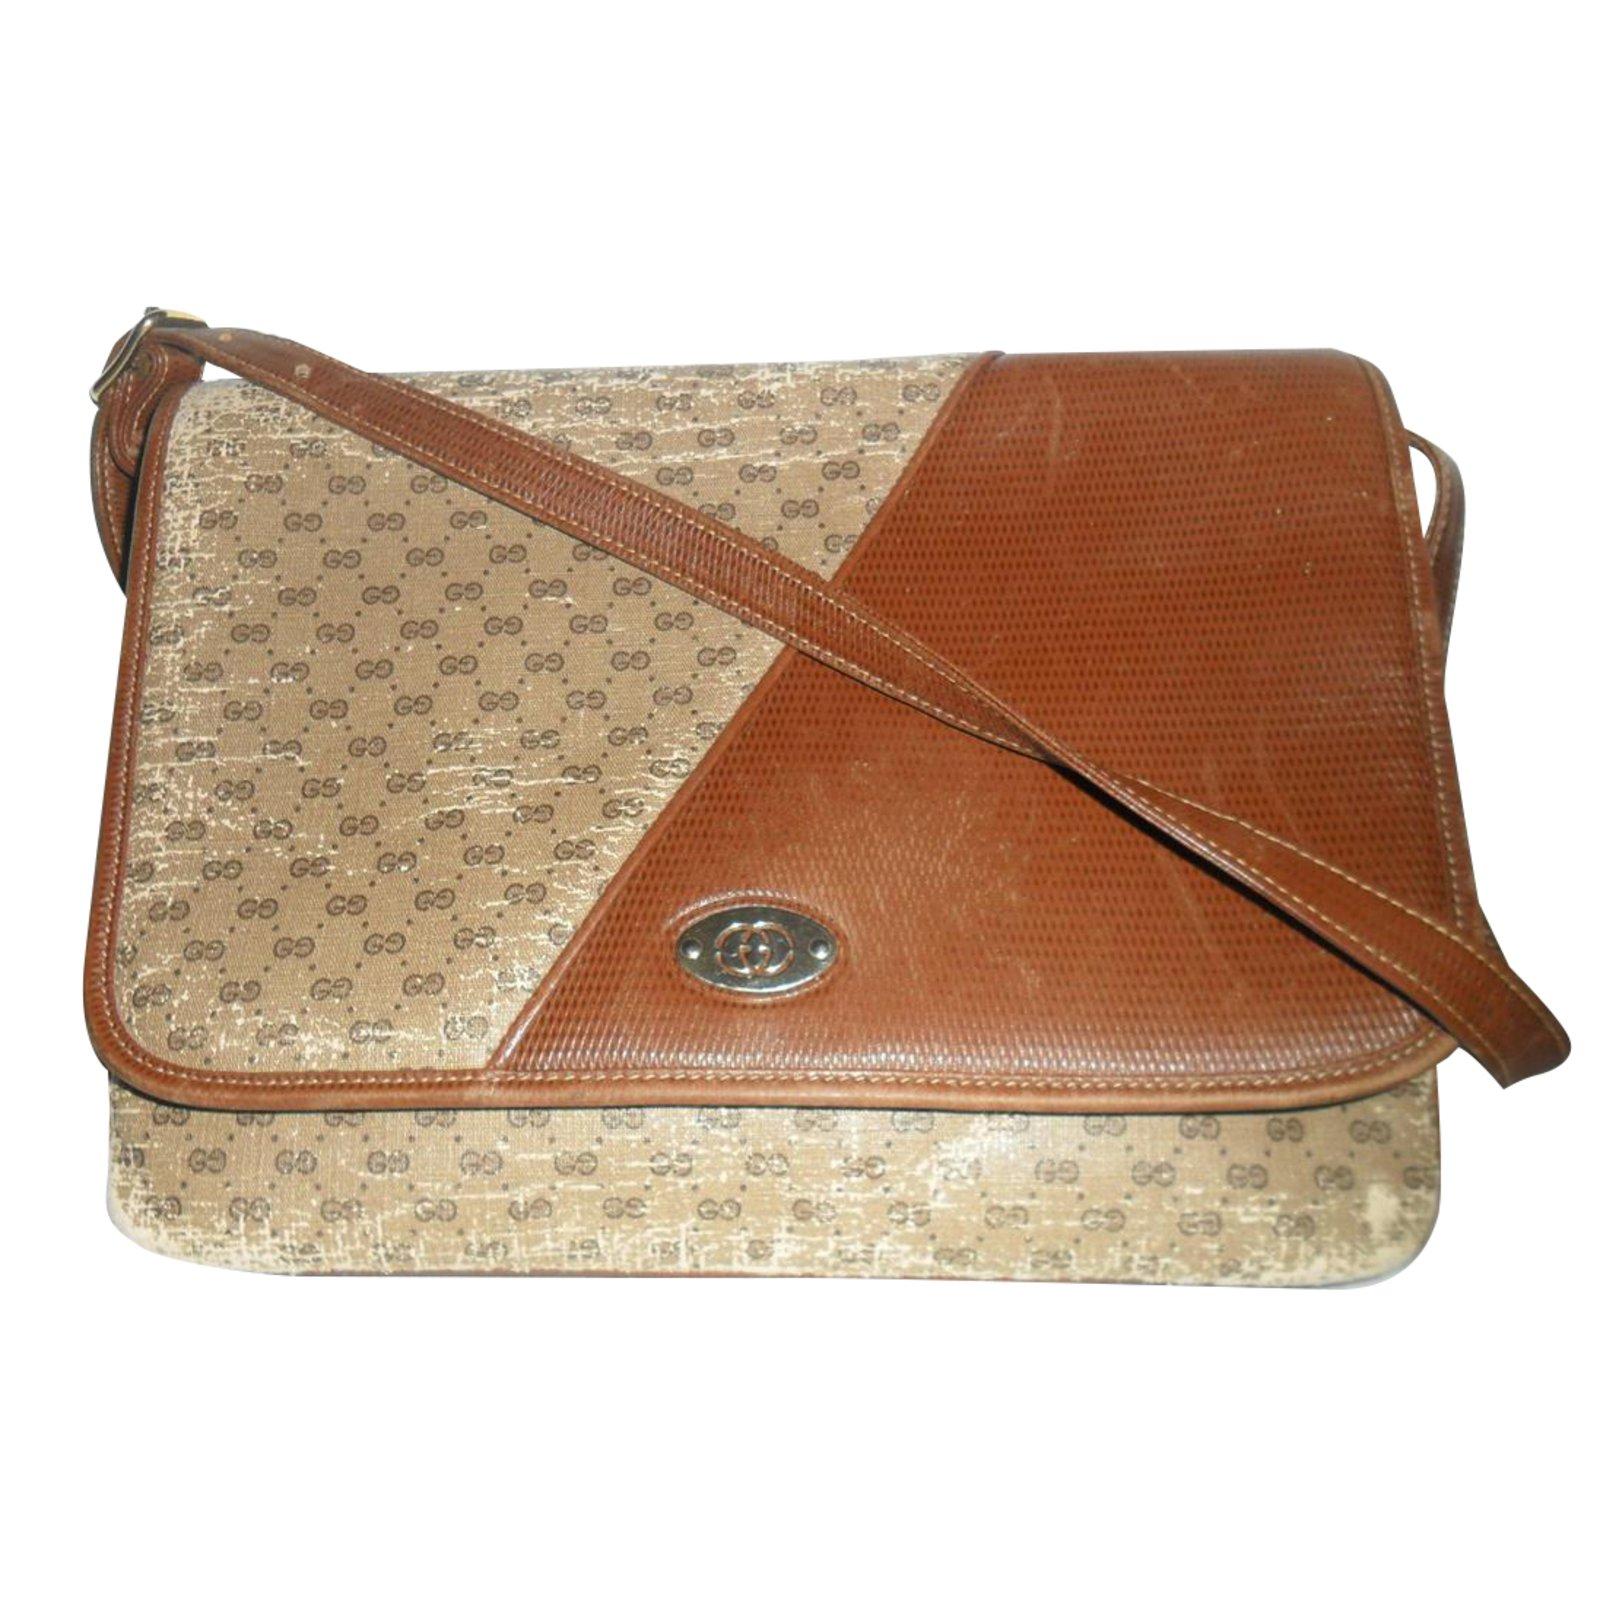 28b556dee3b Gucci vintage bag Handbags Leather Brown